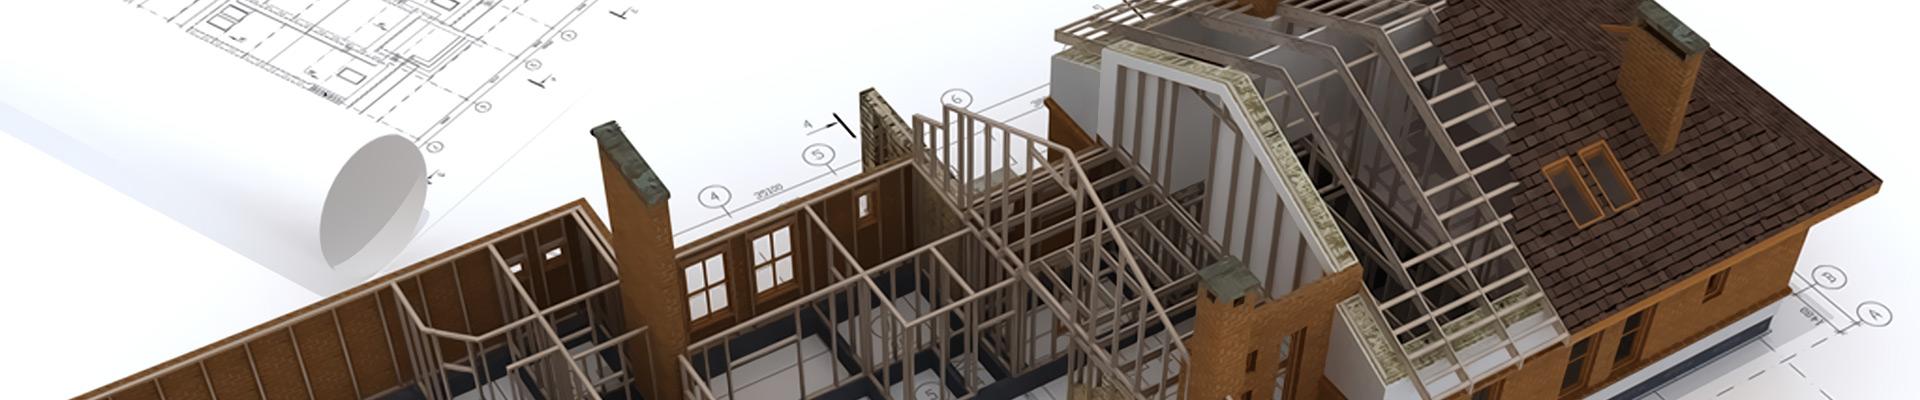 Constructores - DM Proyectos Técnicos